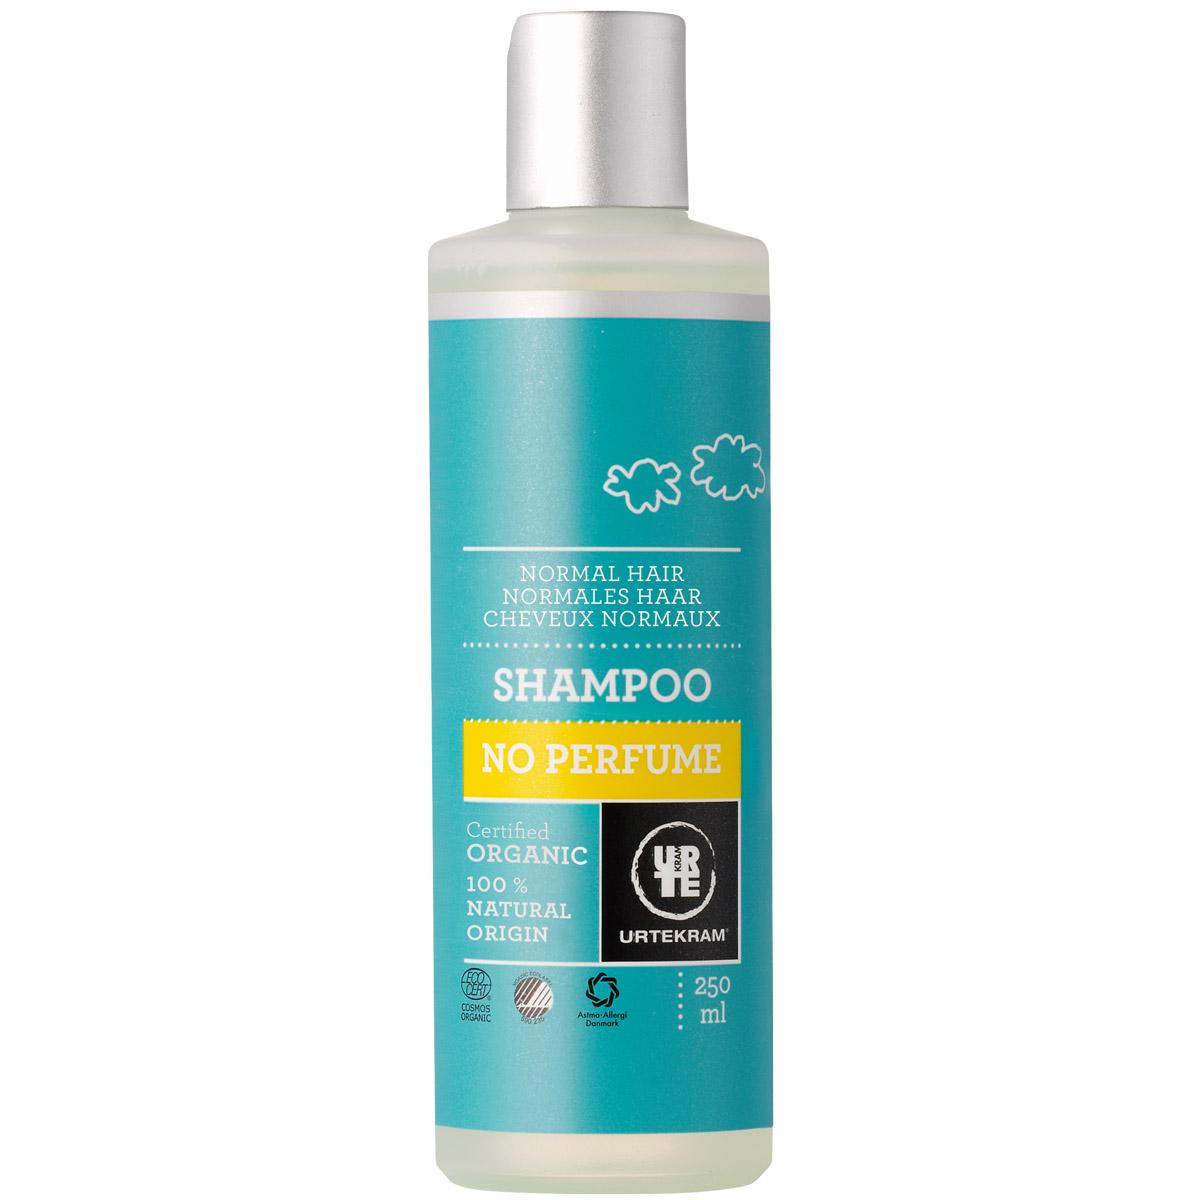 Шампунь для нормальных волос Urtekram без аромата  250 мл<br>